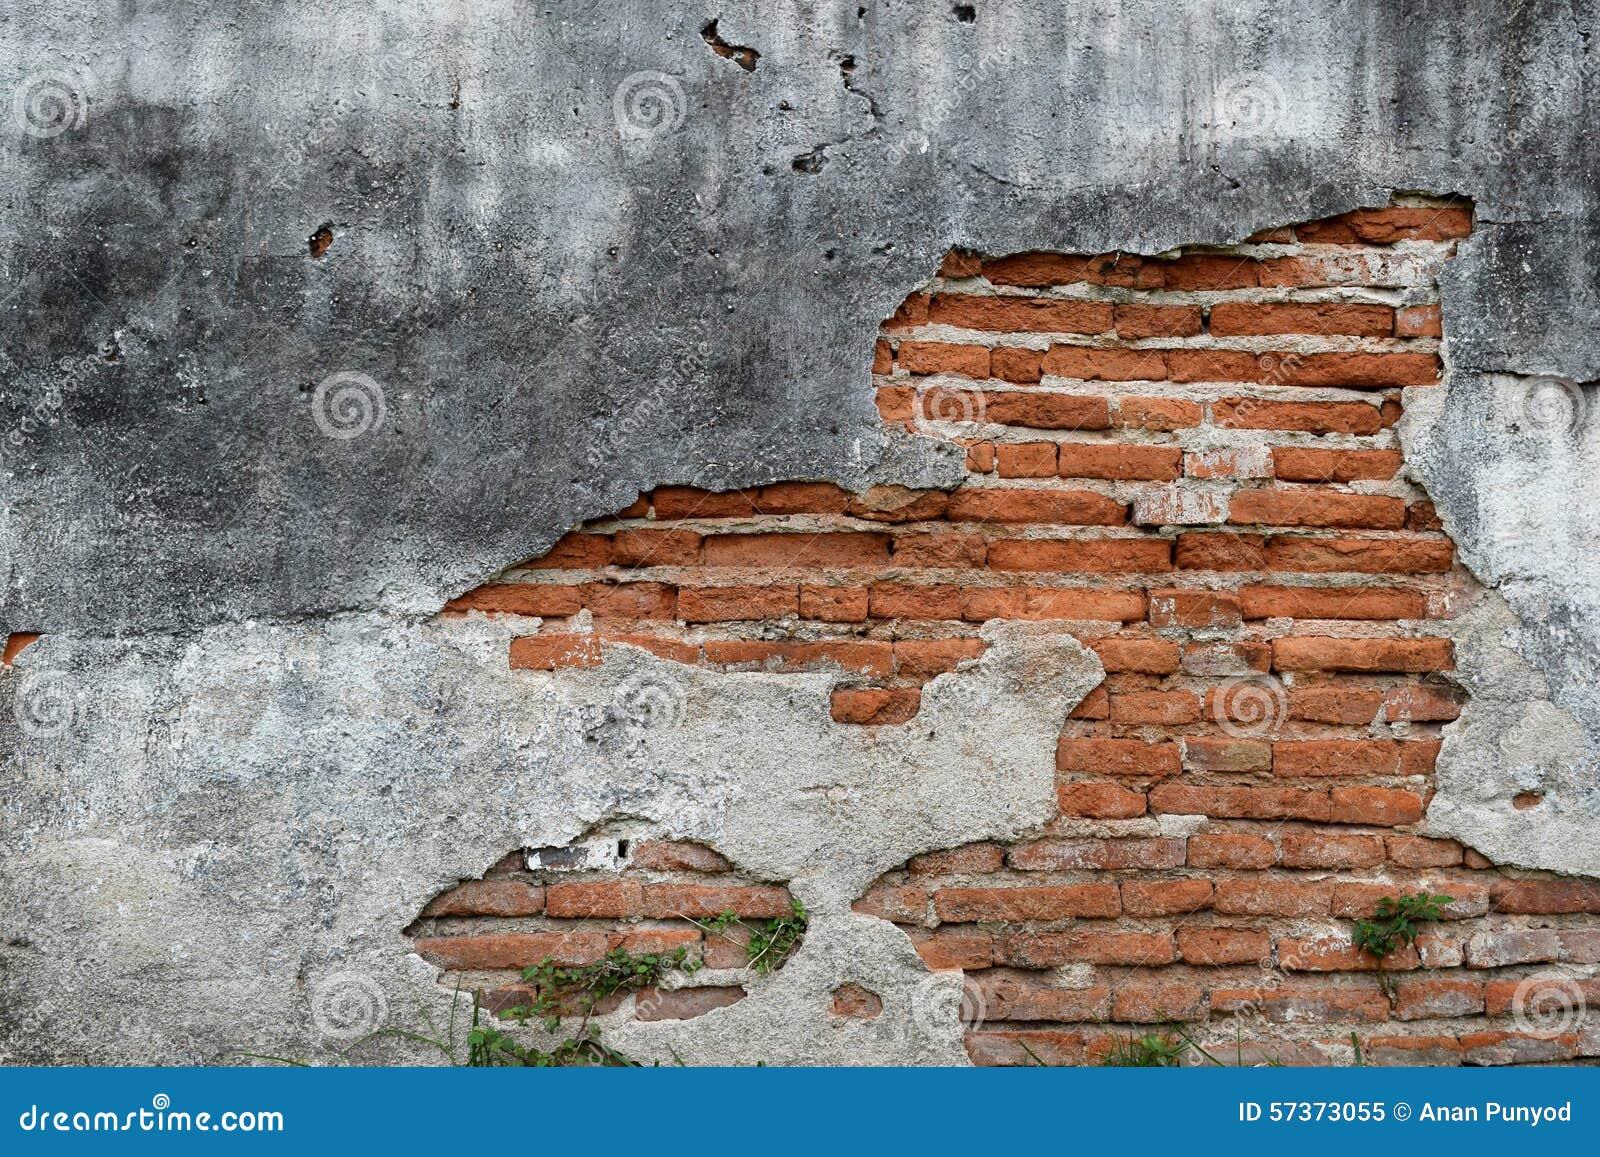 Old Brick Wall Decor : Old wall brick cracks art retro background stock image